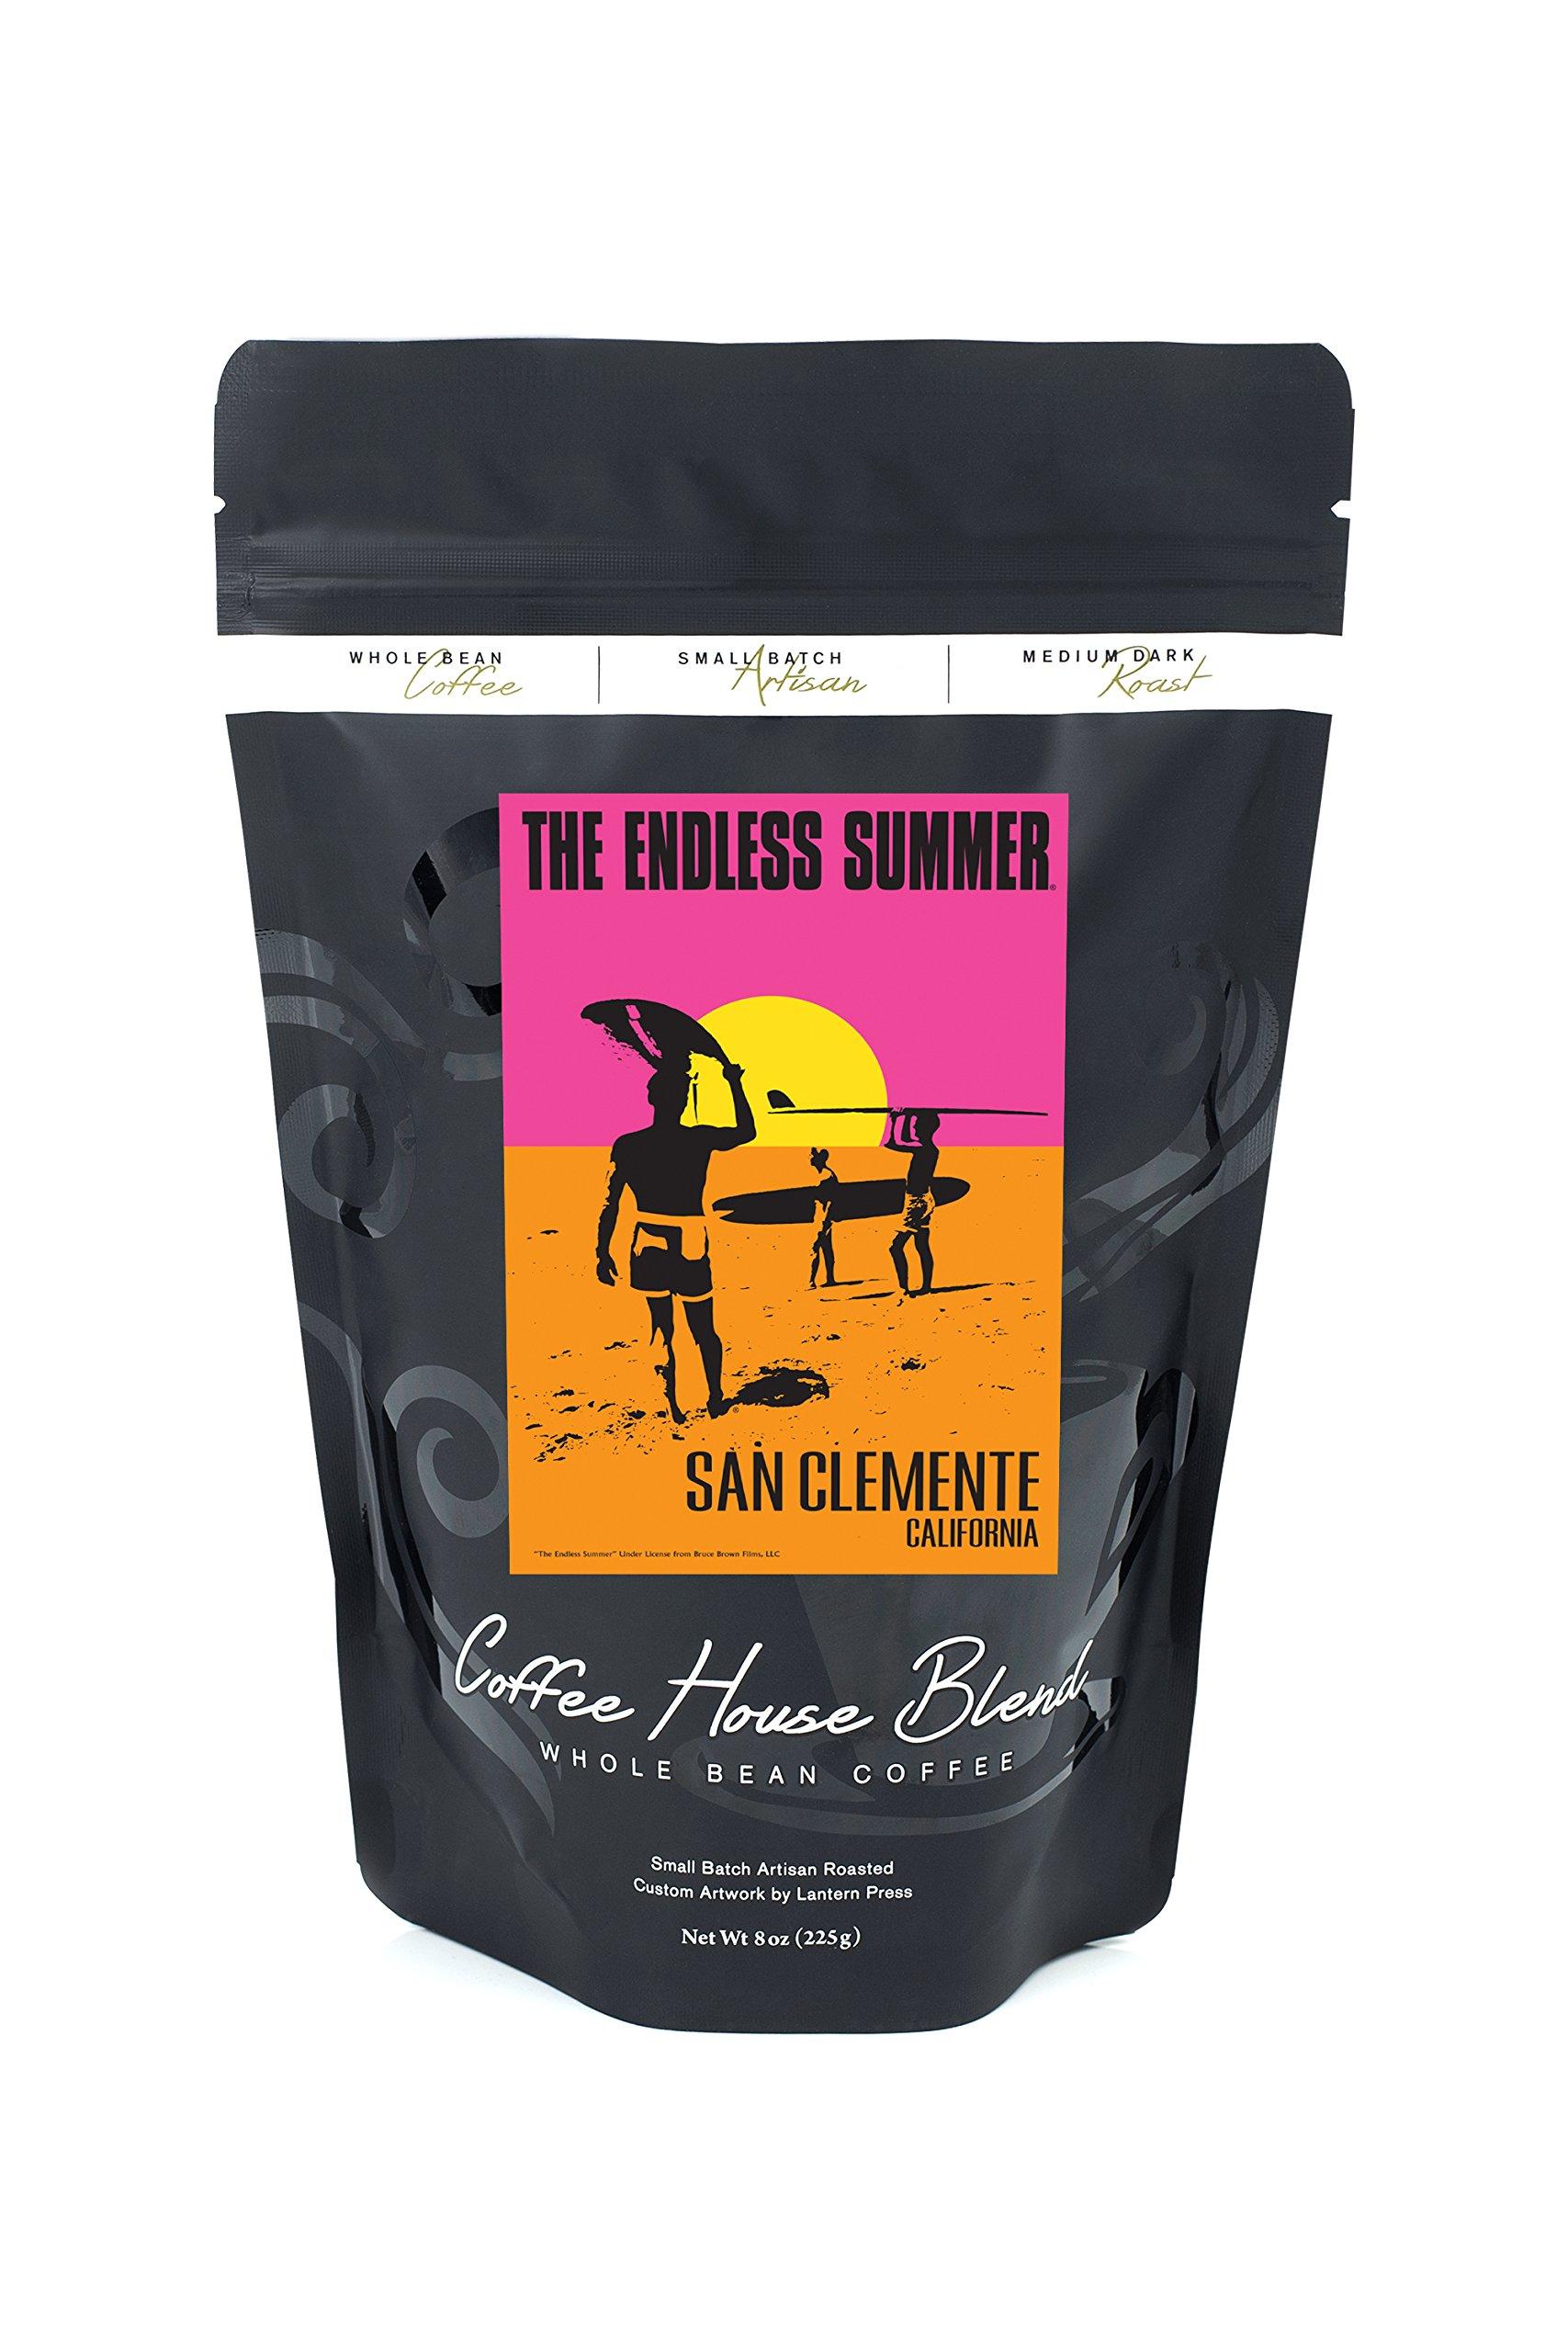 San Clemente, California - The Endless Summer - Original Movie Poster (8oz Whole Bean Small Batch Artisan Coffee - Bold & Strong Medium Dark Roast w/ Artwork)